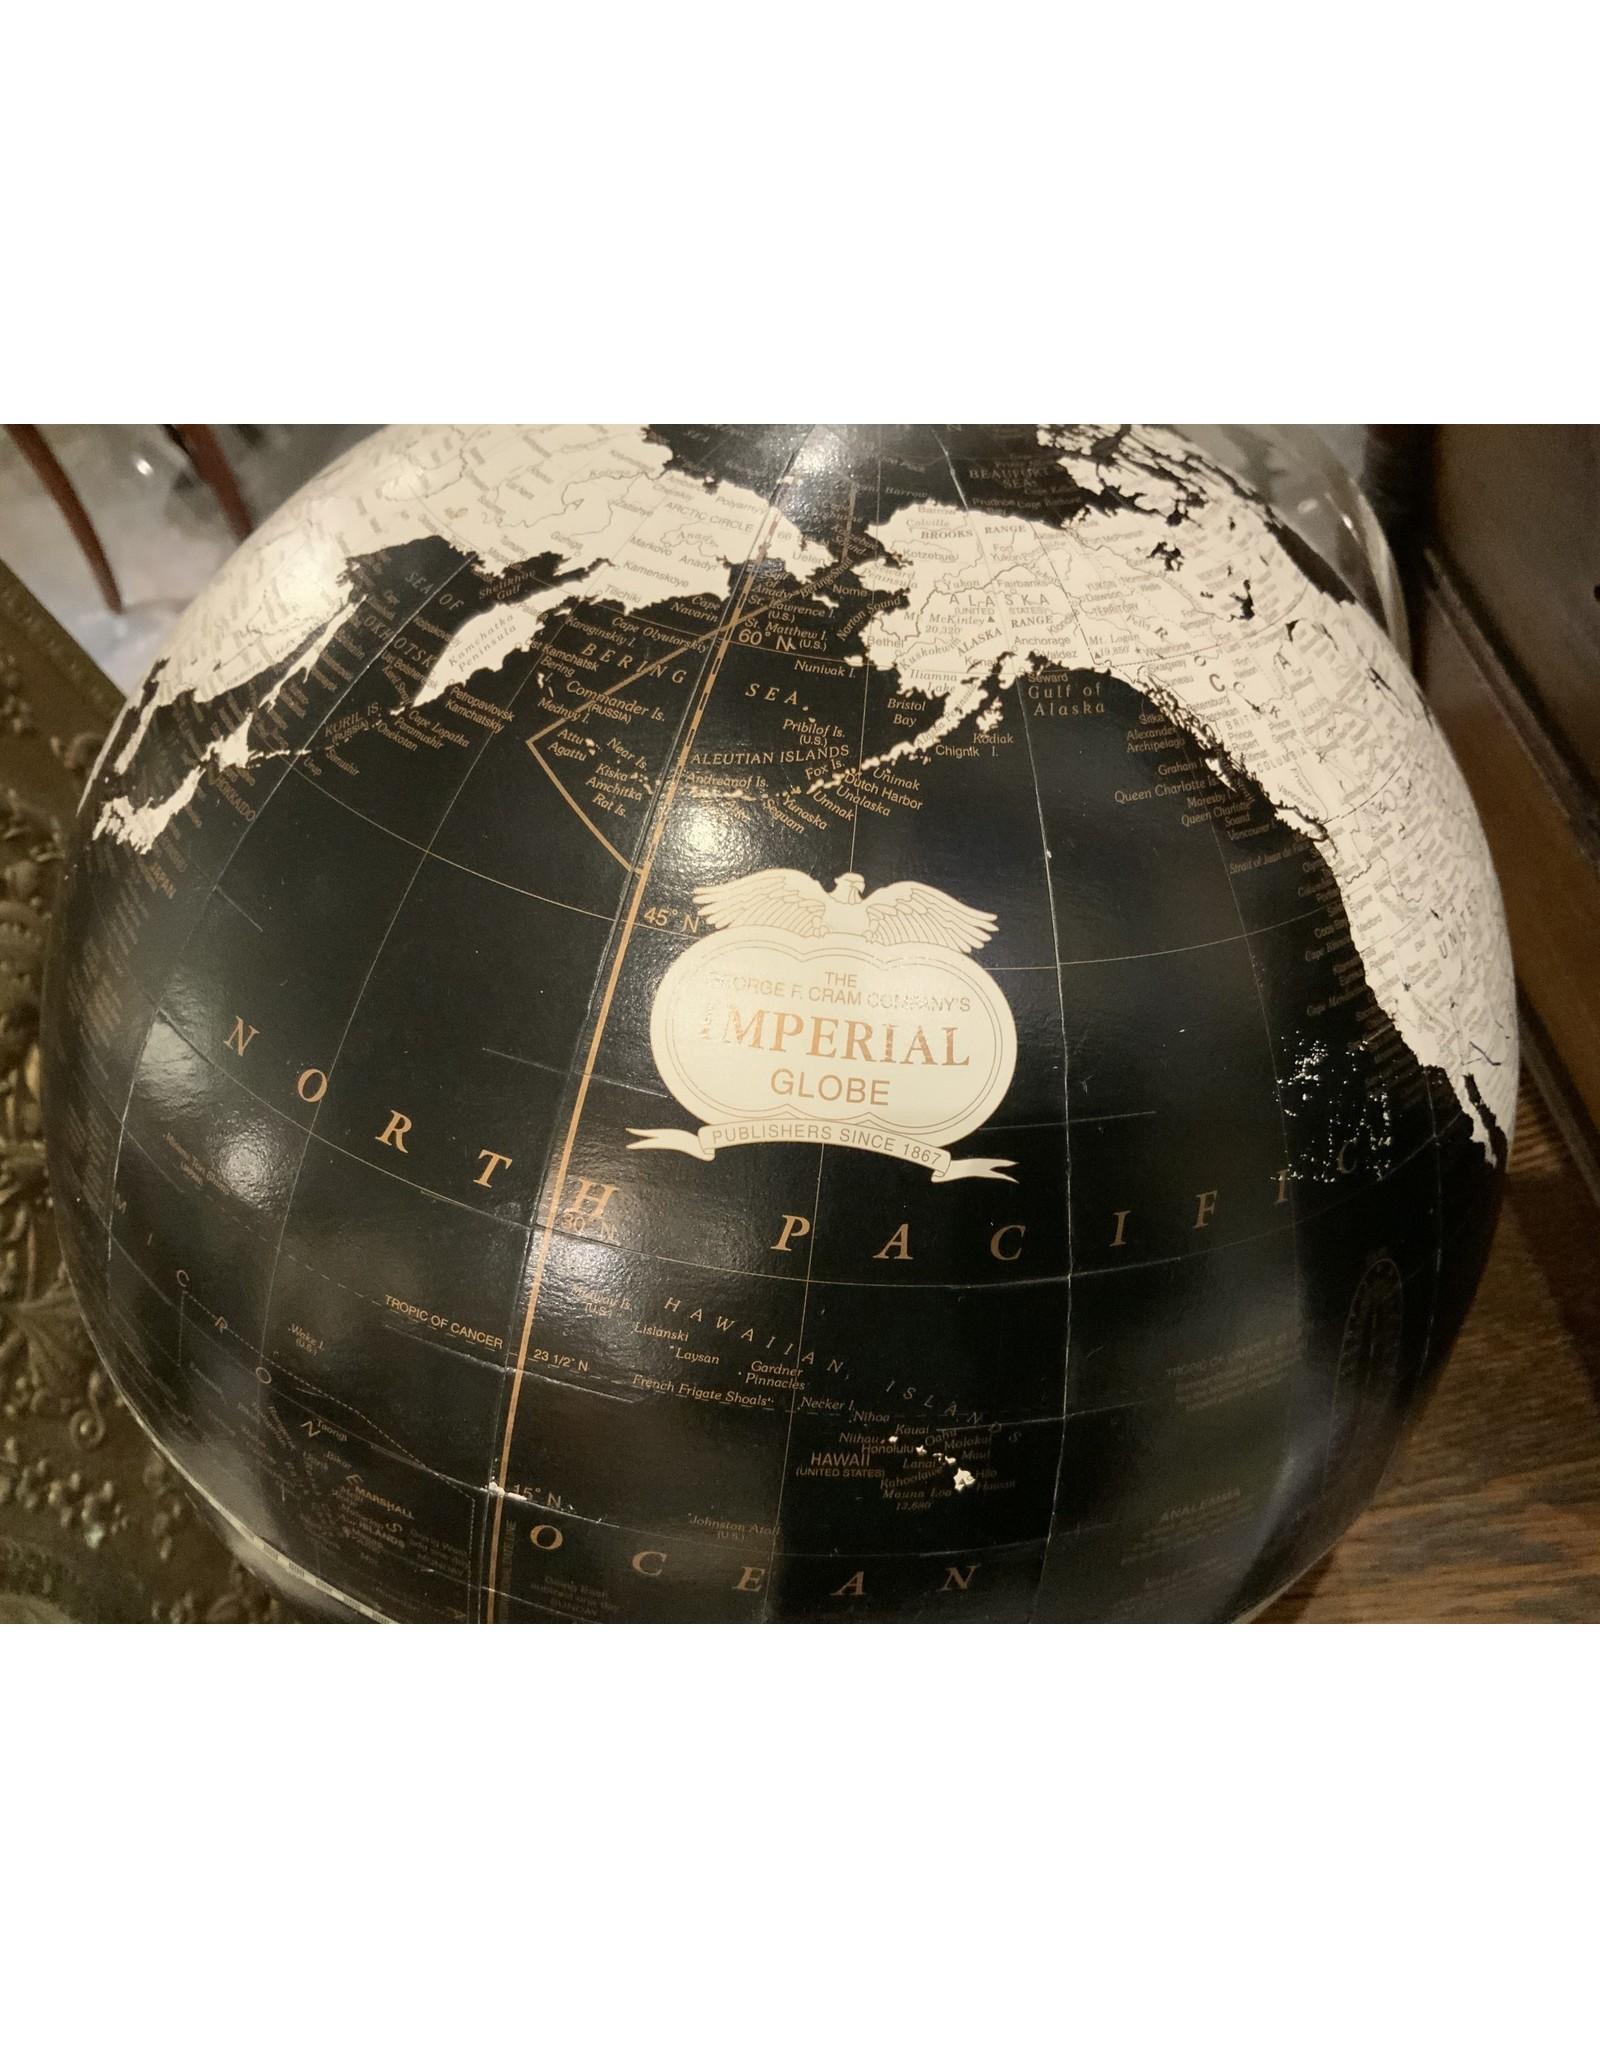 SPV The George F. Cram Co. Imperial Globe MCM Black and White